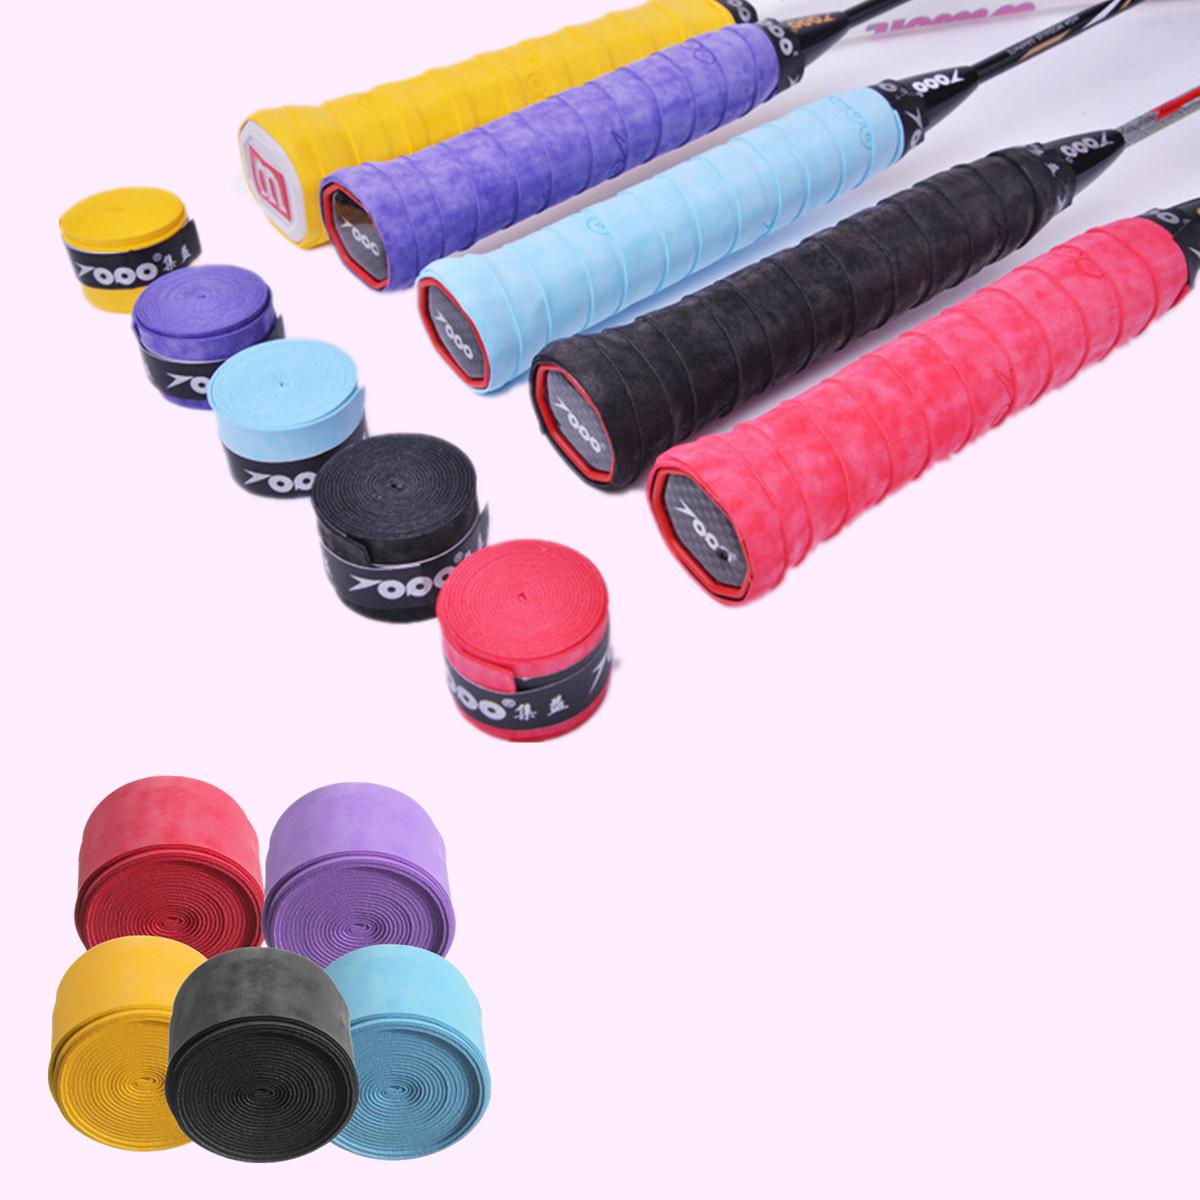 2511000.75mm Anti Slip Tennis Racket Grip Tapes Badminton Racket Grip Tape Squash Tape